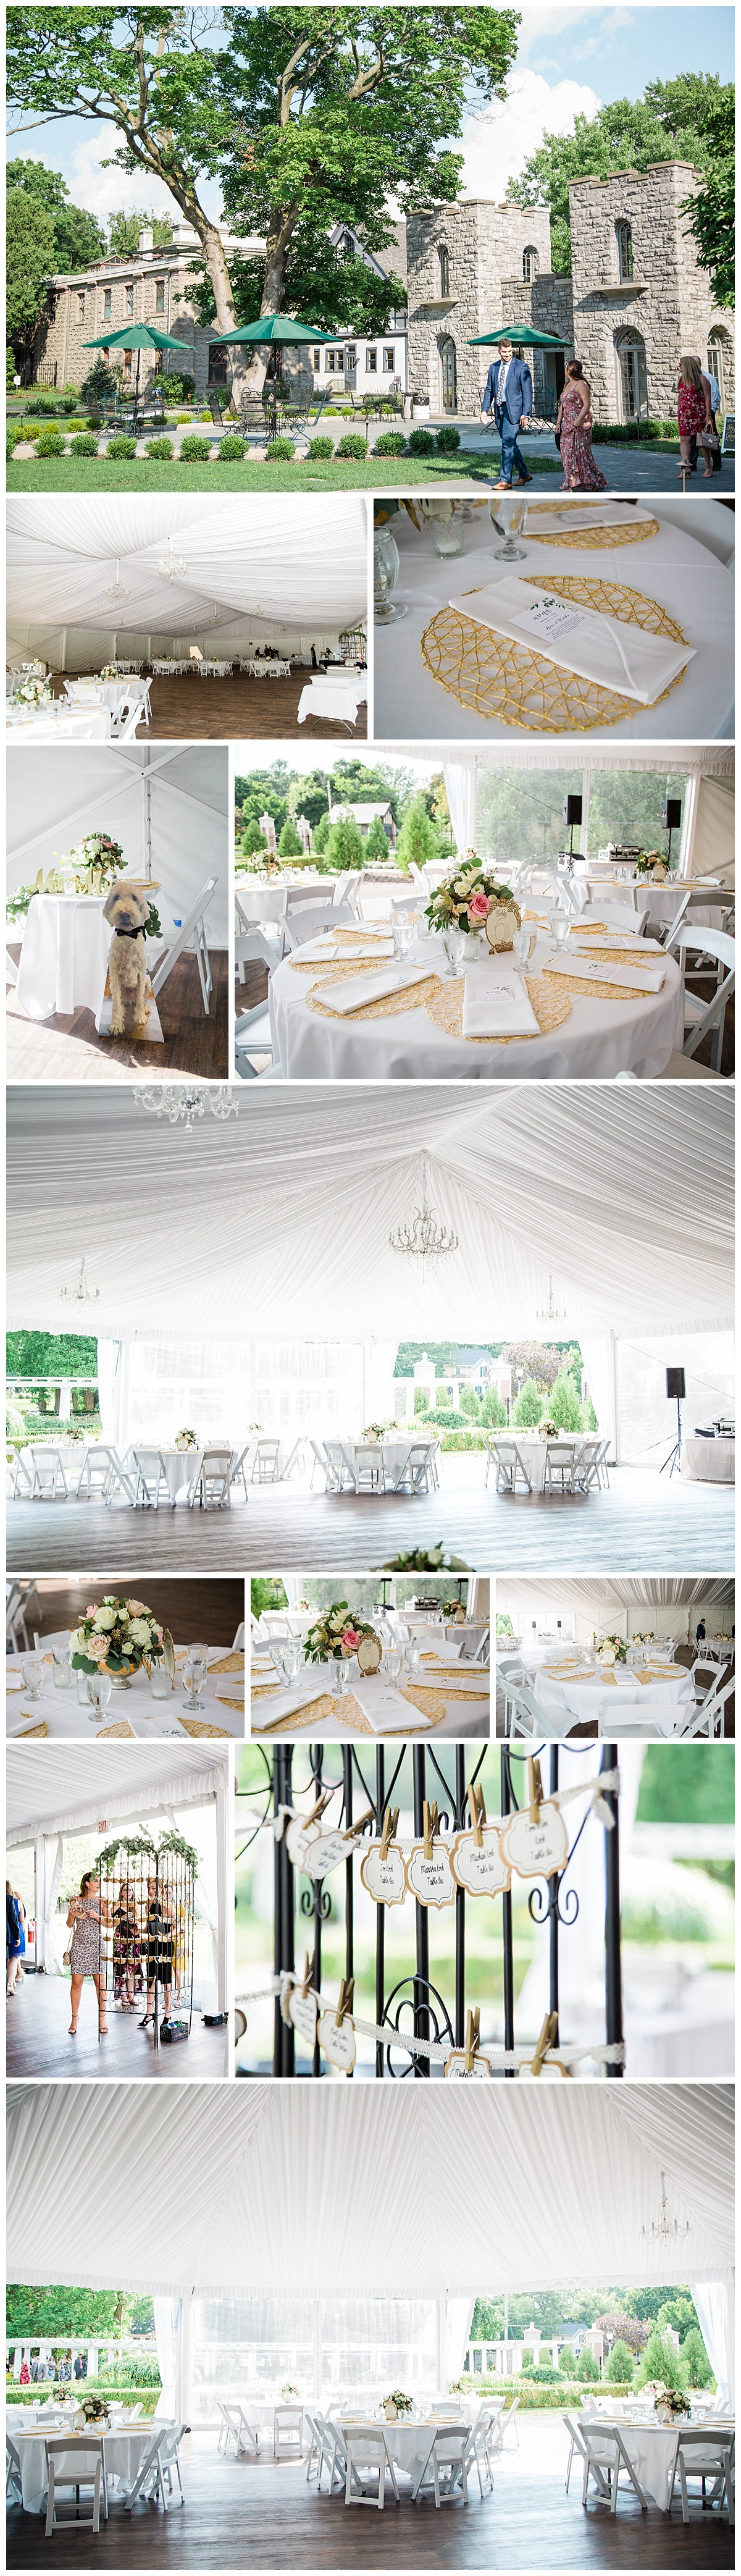 Rachel and Nick - Sonnenberg Gardens Wedding-700.jpg